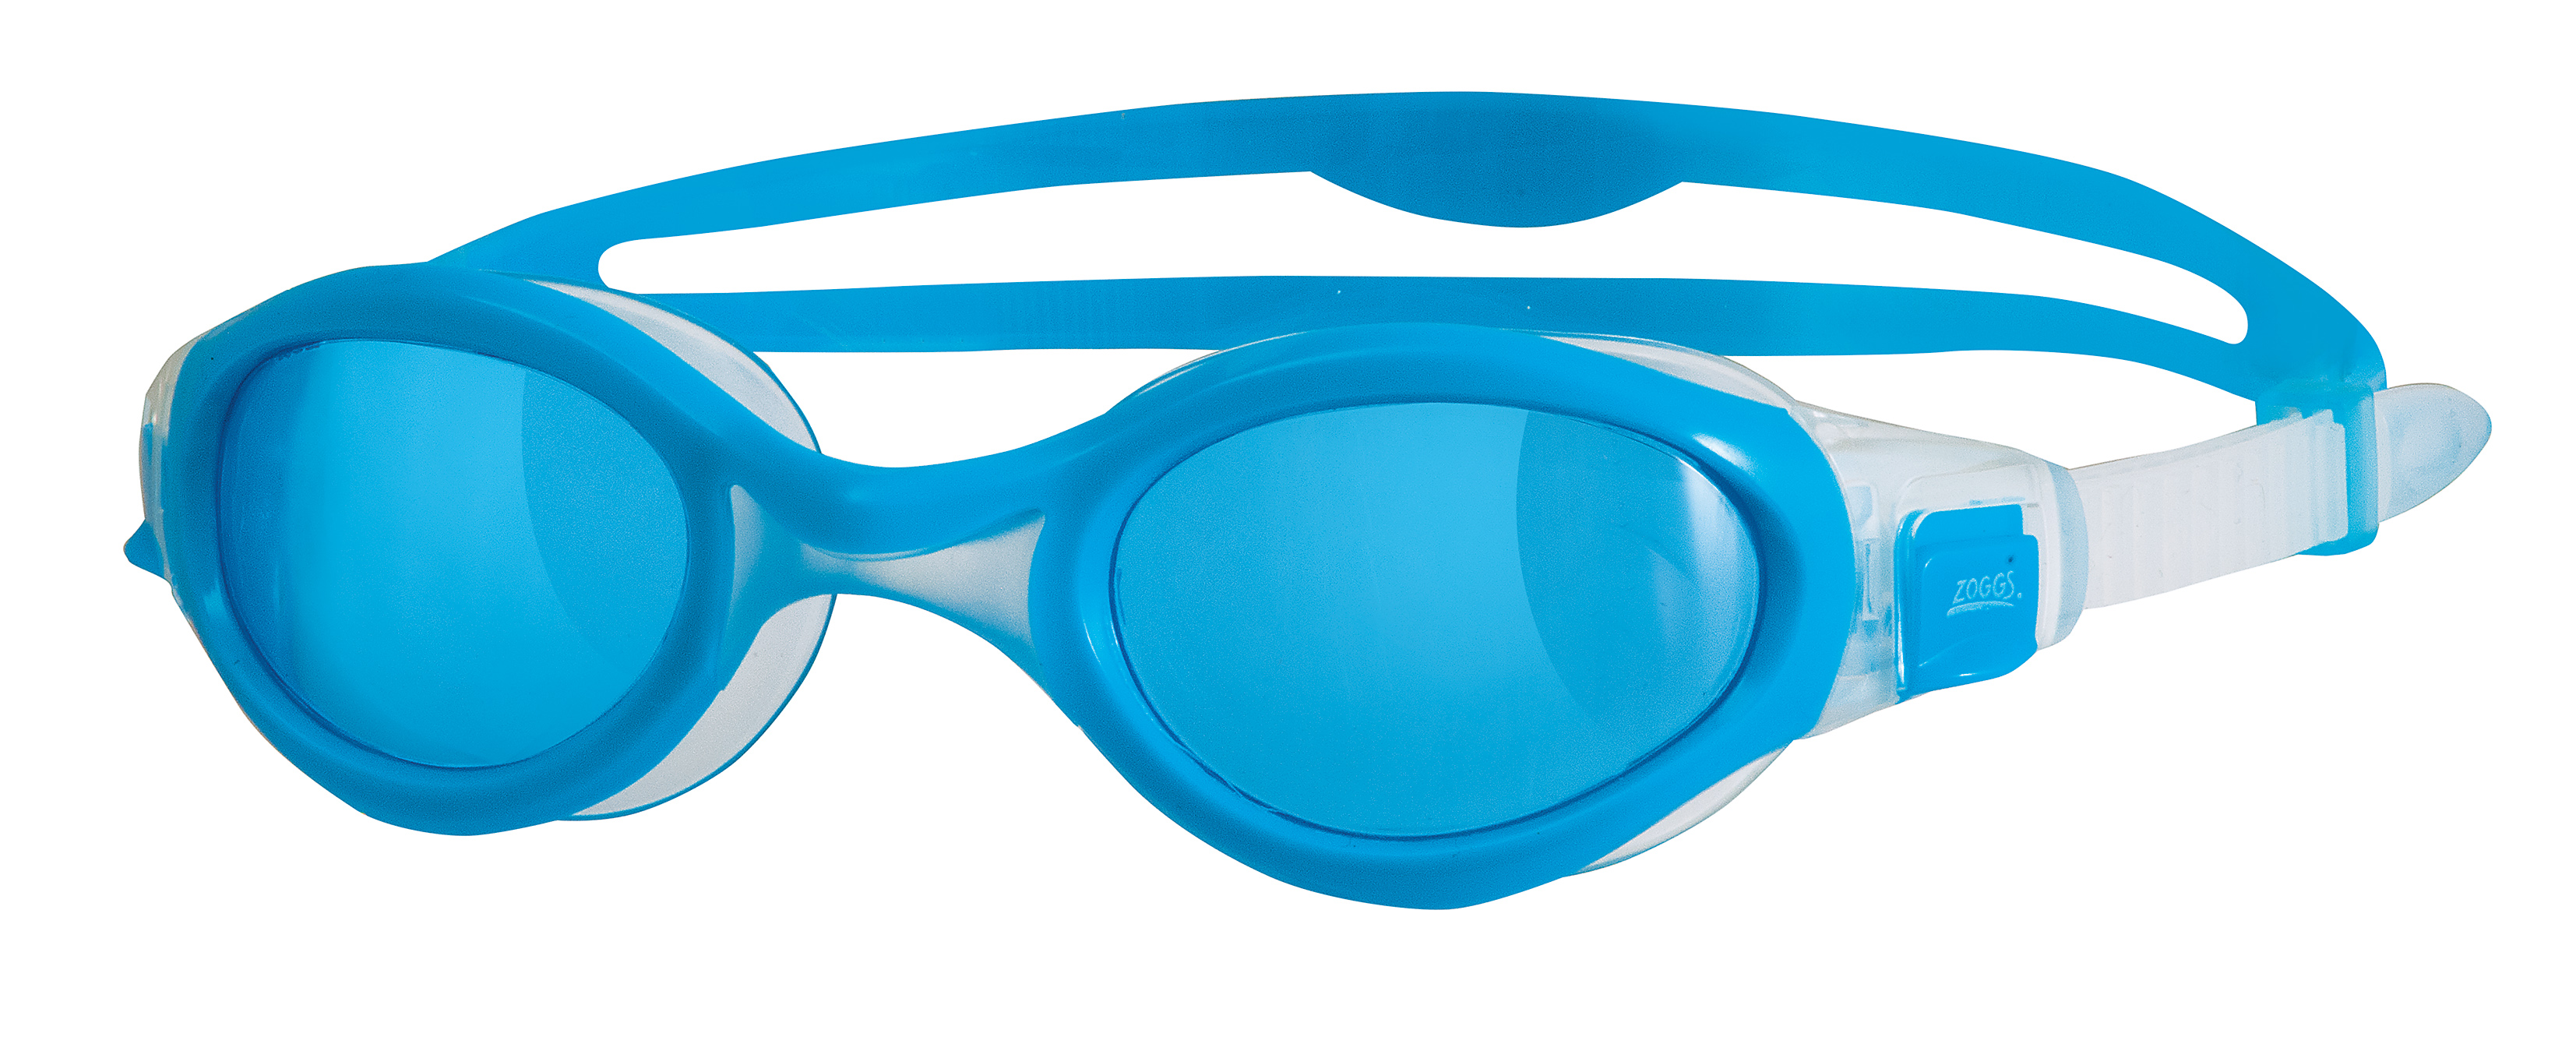 300486 blue-blue clear